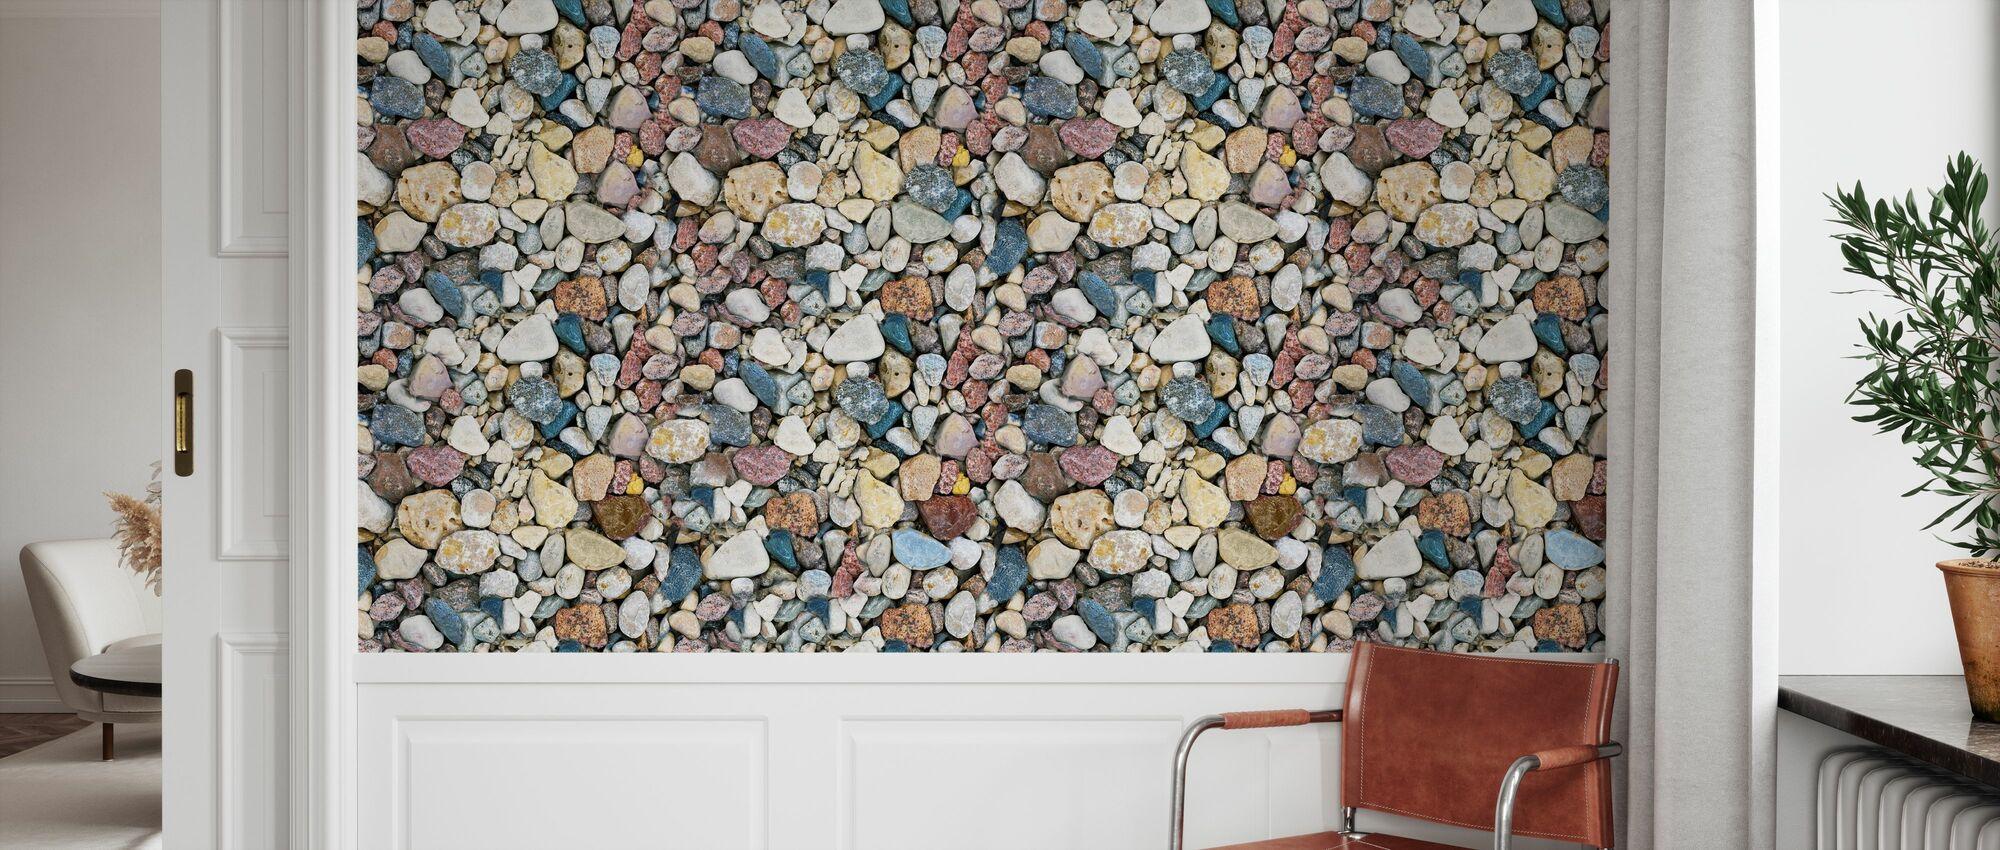 Colorful Sea Stones - Wallpaper - Hallway